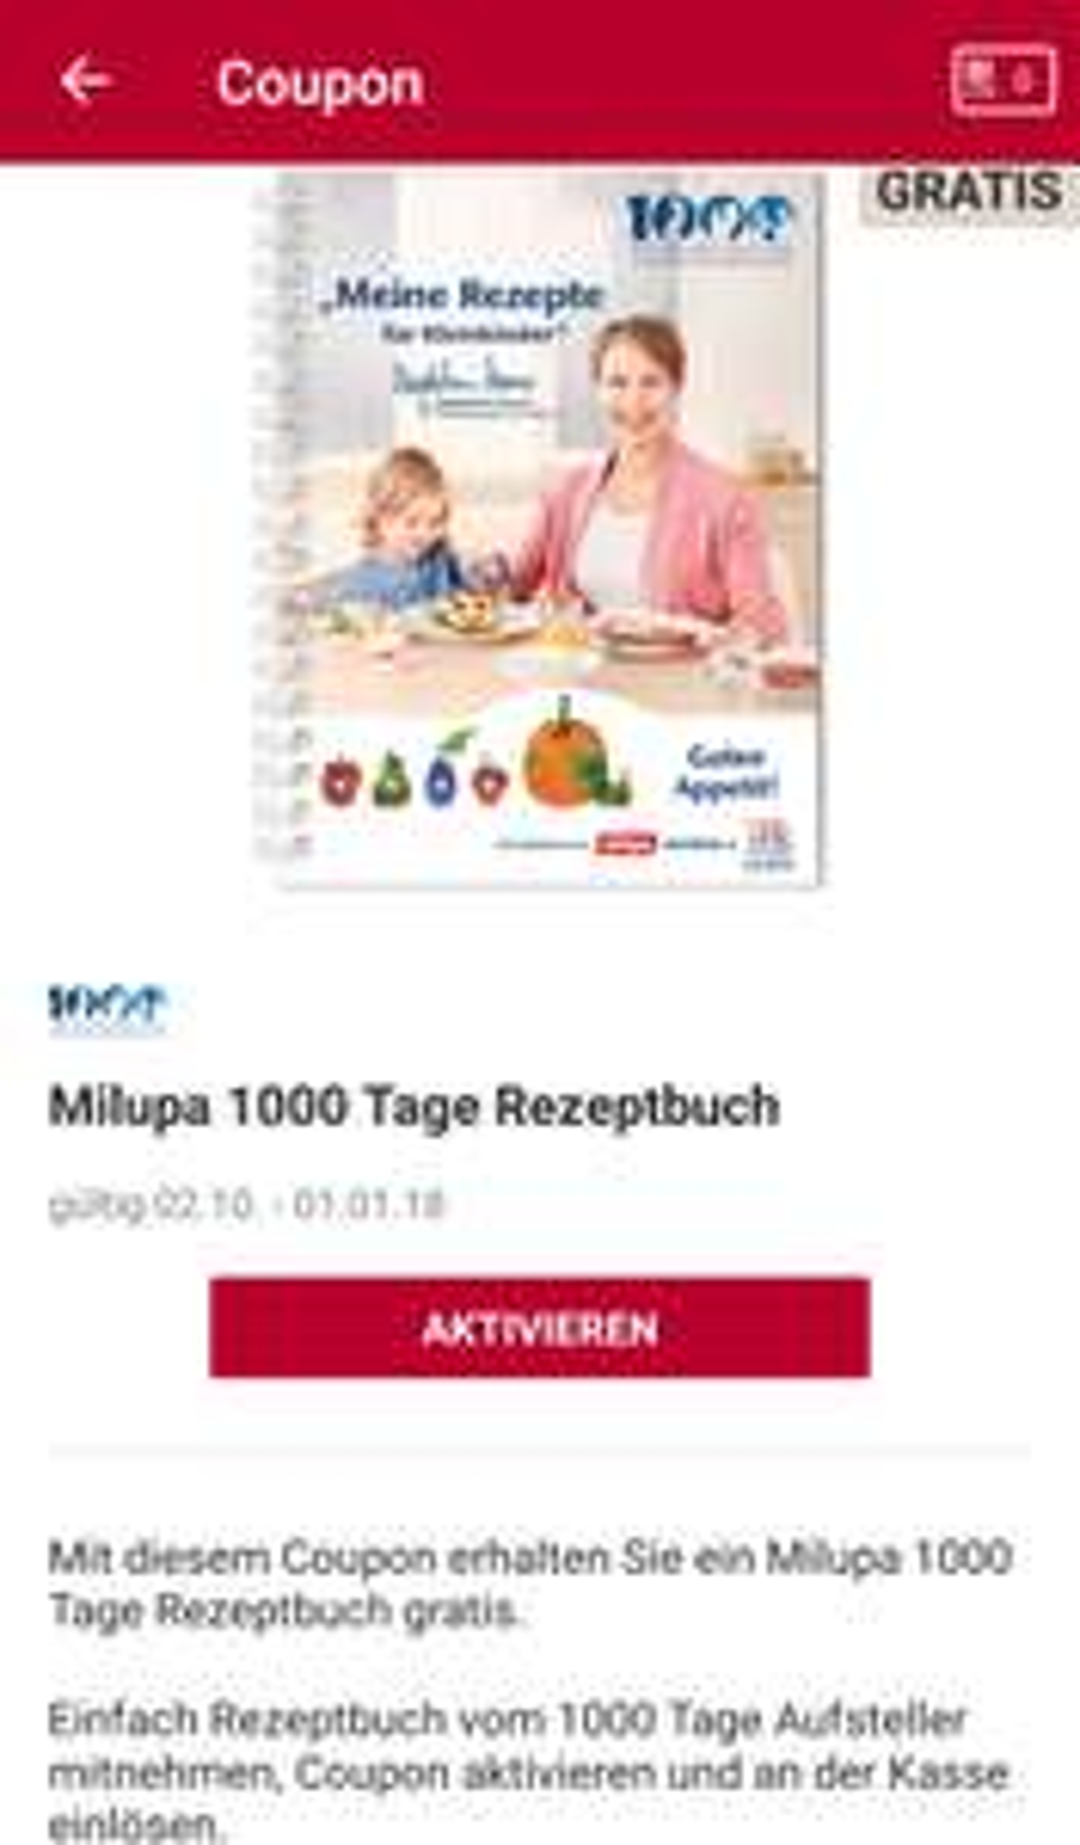 [Rossmann] Milupa 1000 Tage Rezeptbuch gratis